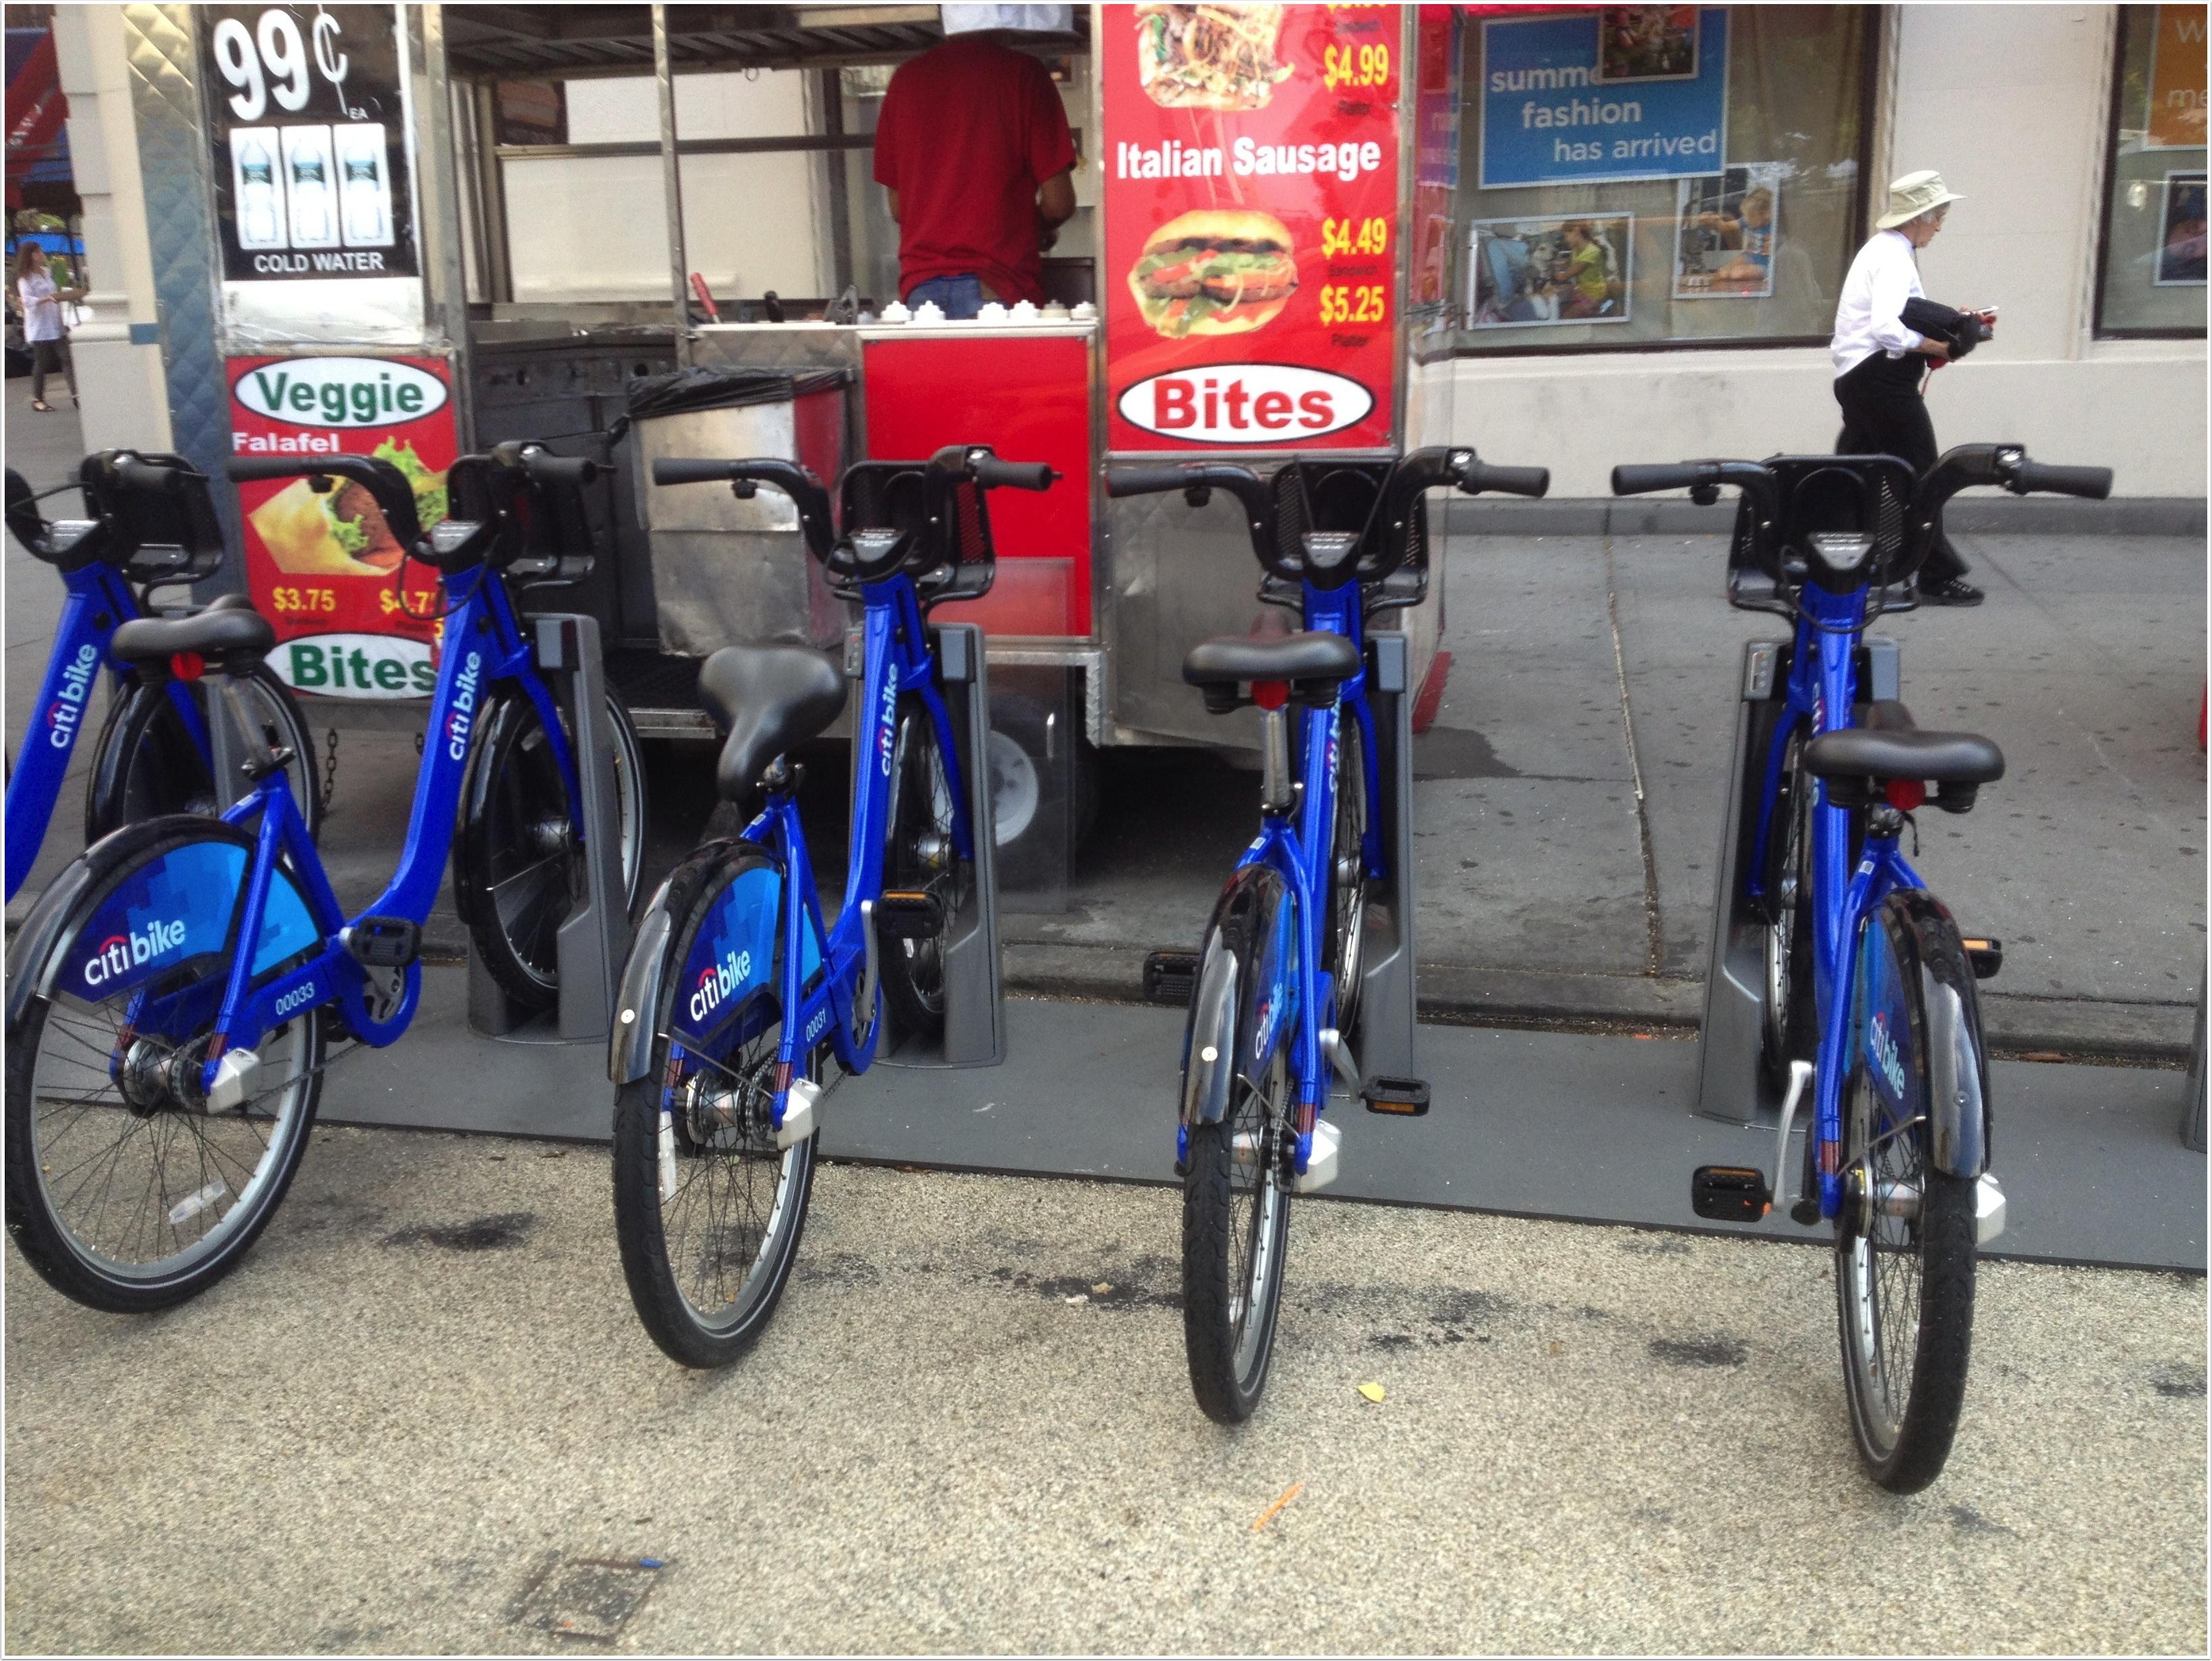 Shared bikes